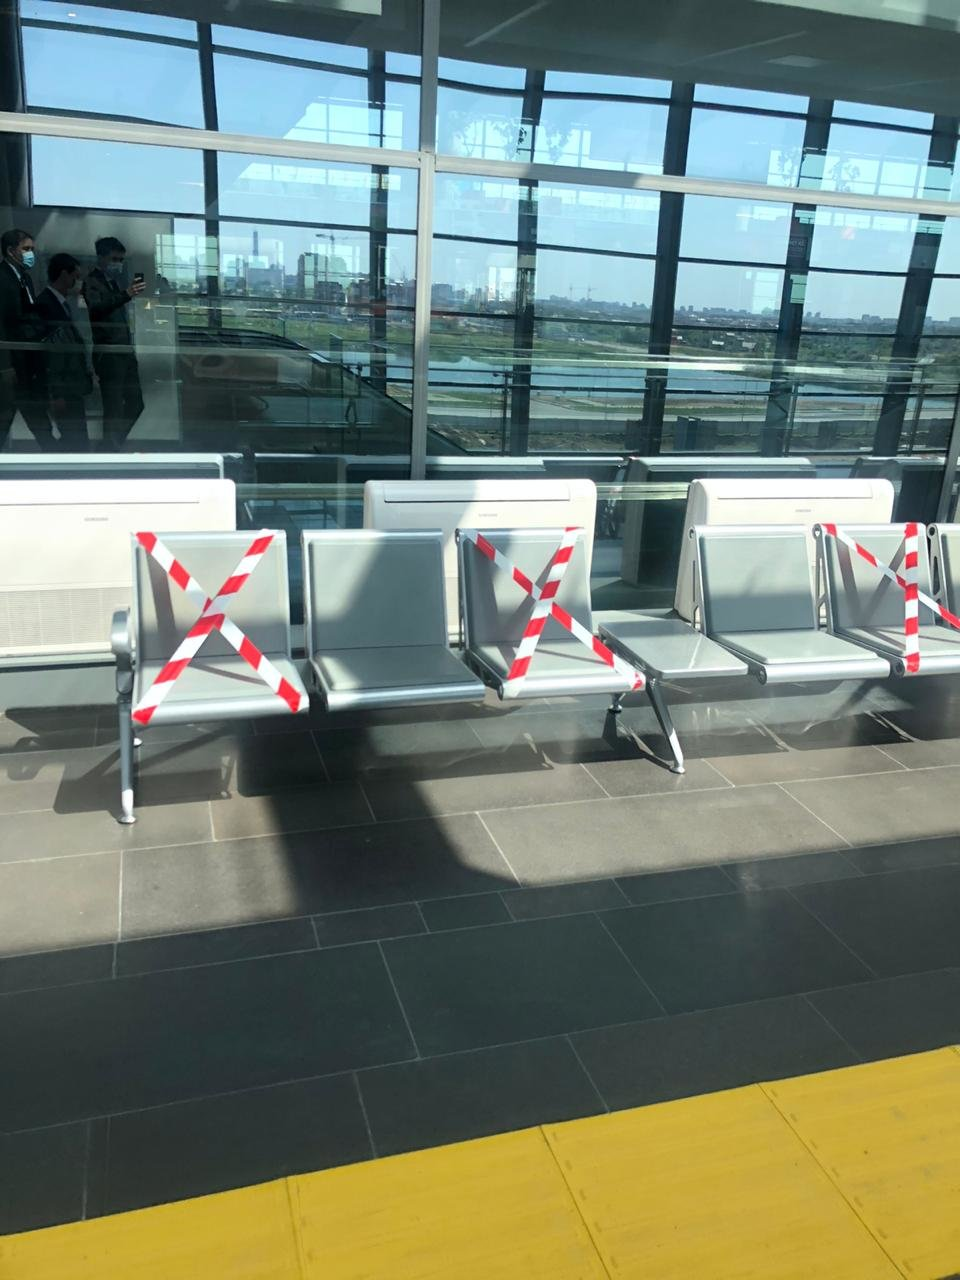 Вокзалы Нур-Султана готовы к запуску пассажирских перевозок , фото-2